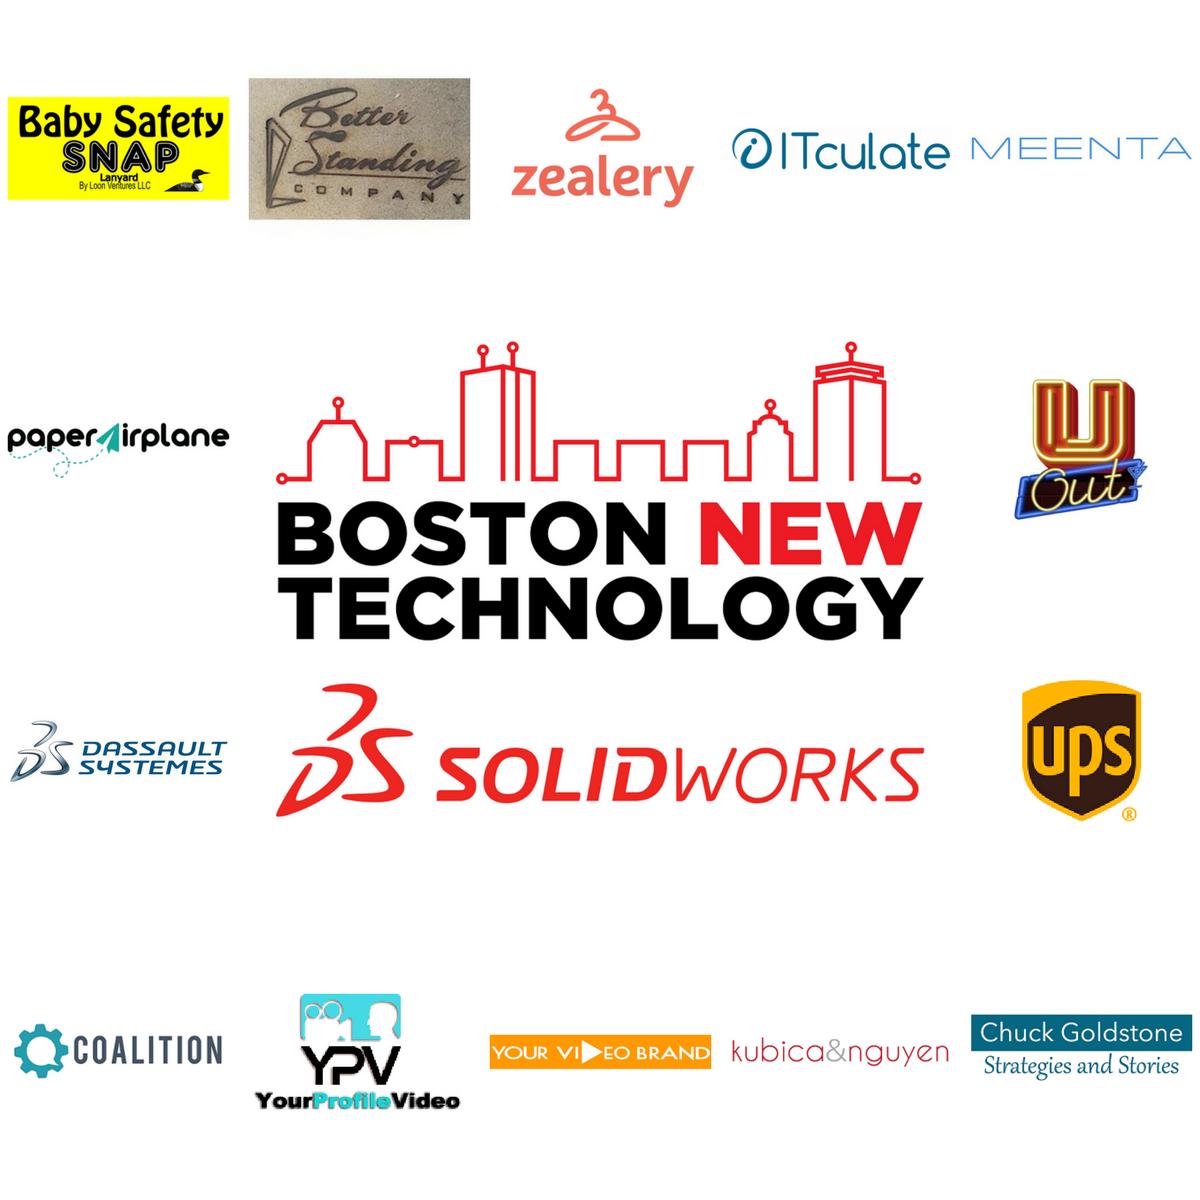 Boston New Technology January 2018 Startup Showcase